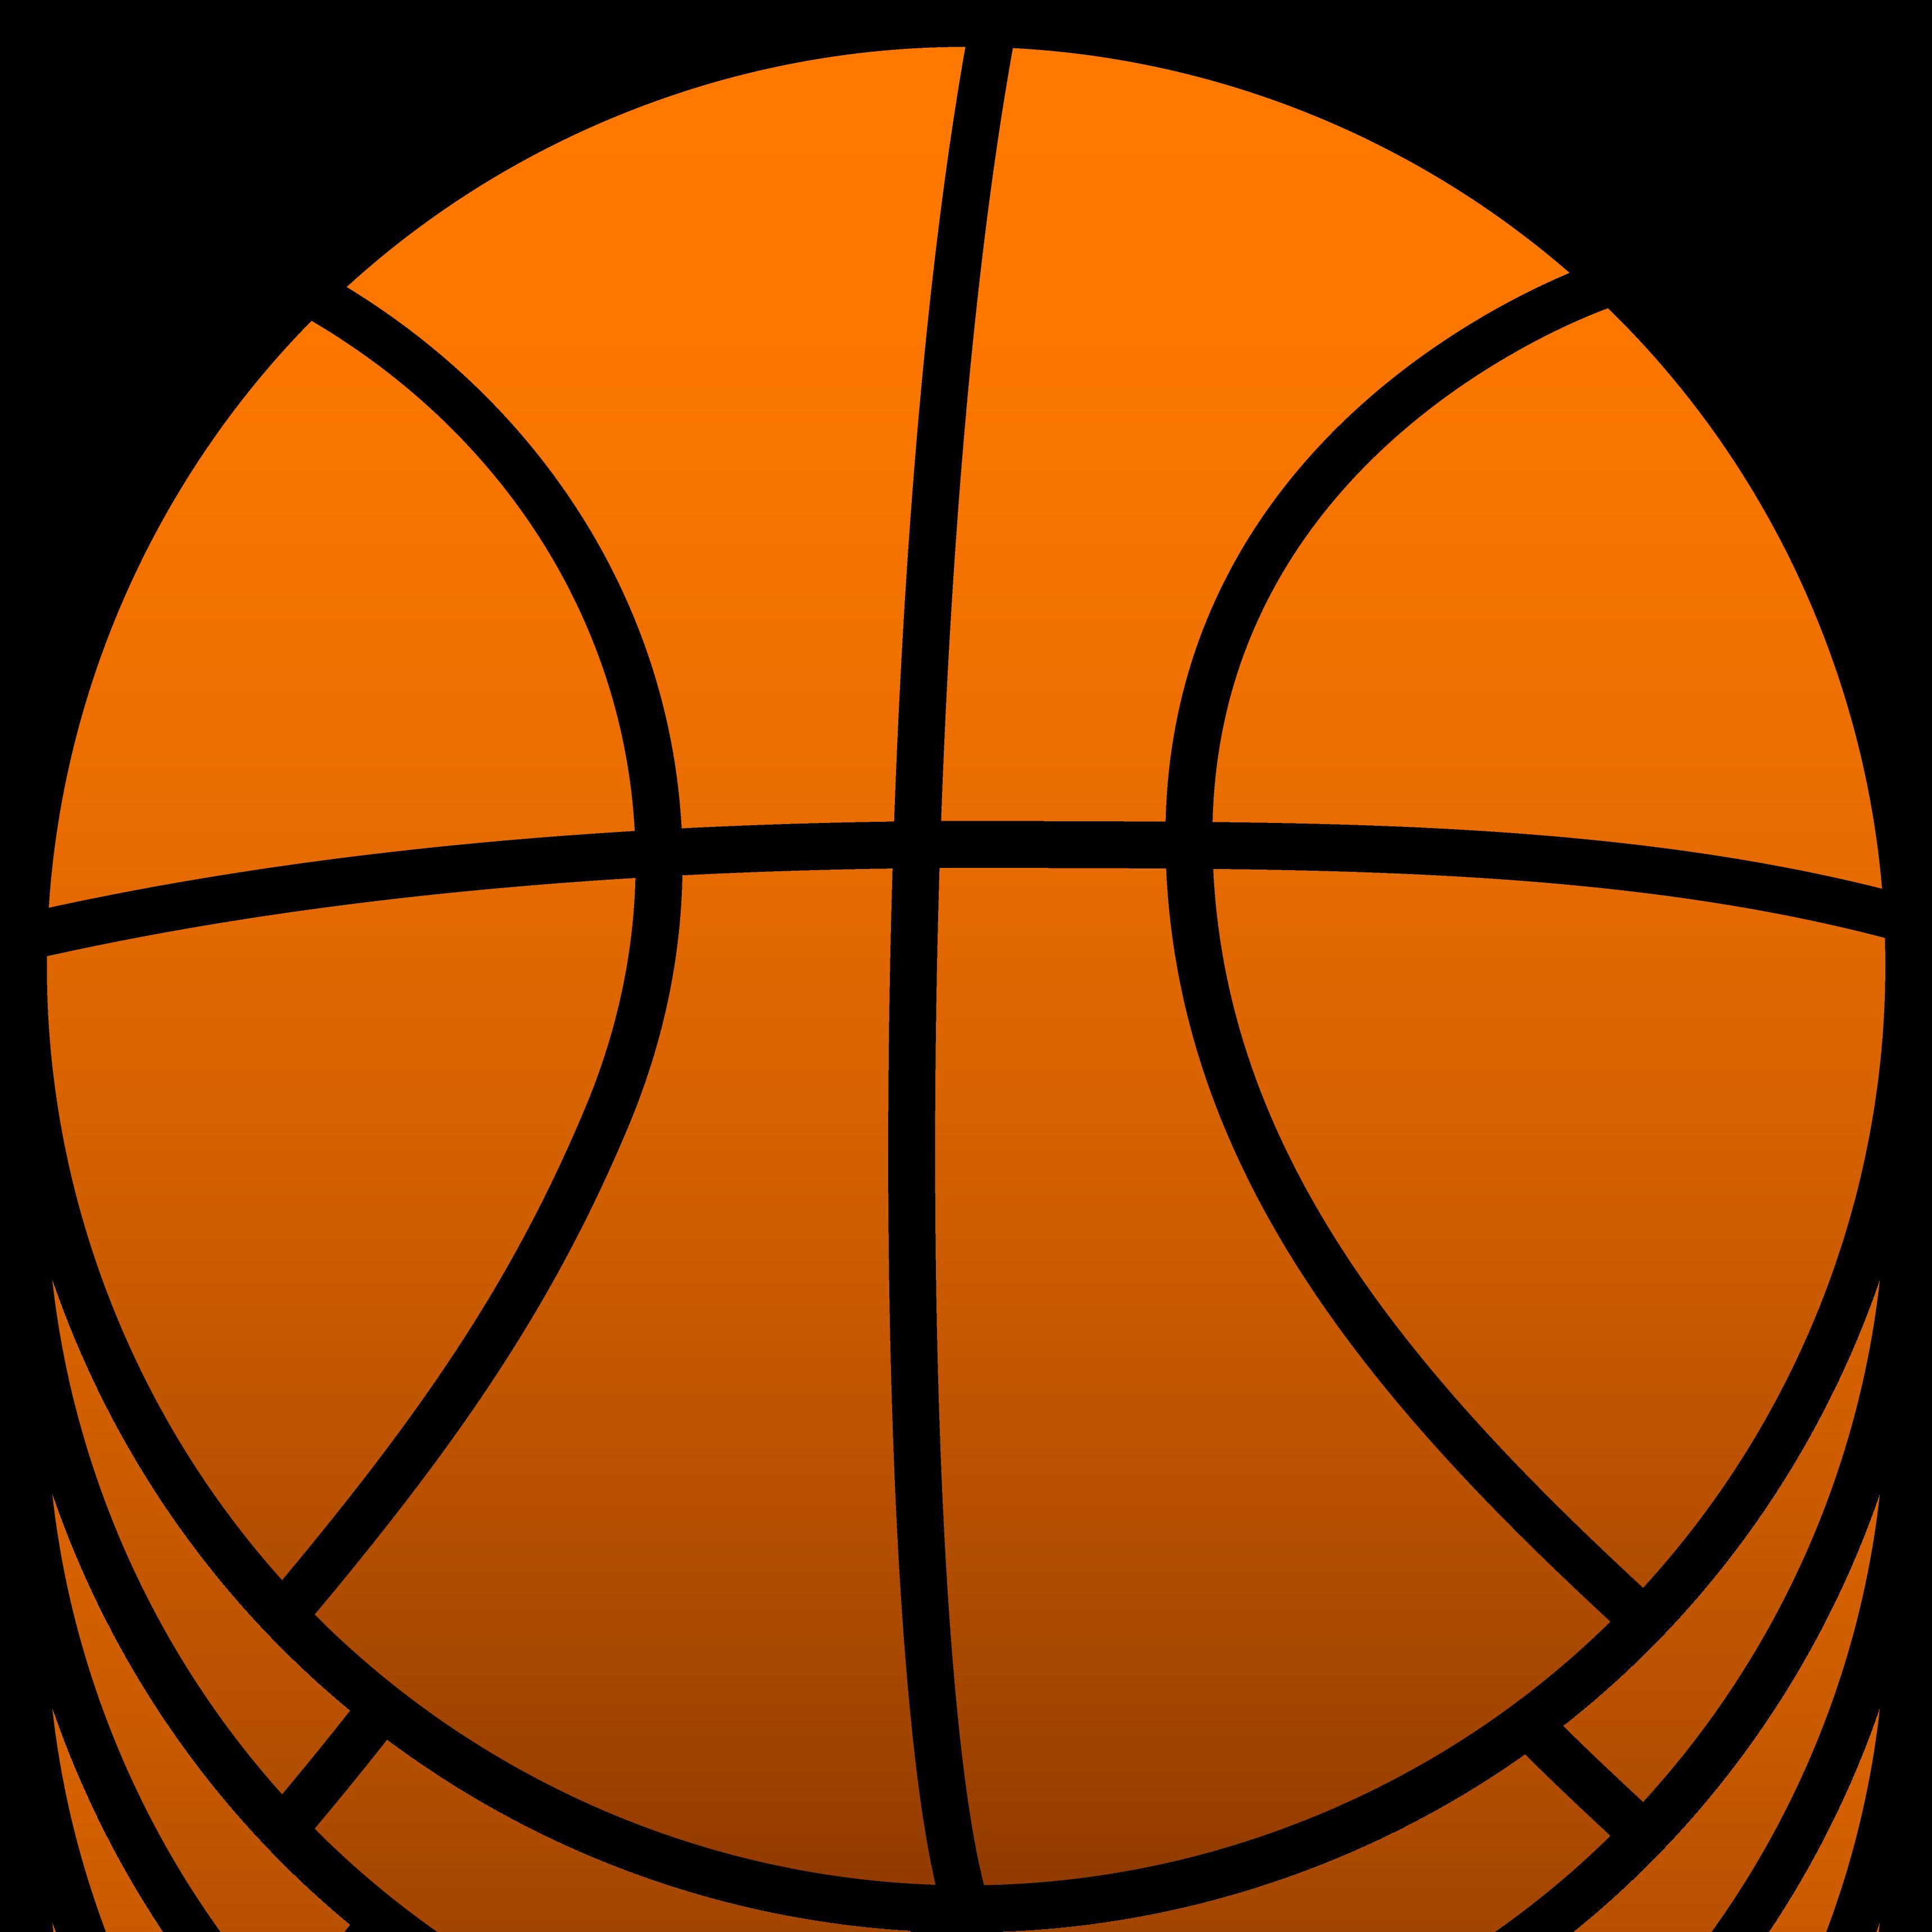 Basketball Clipart-Clipartlook.com-3437